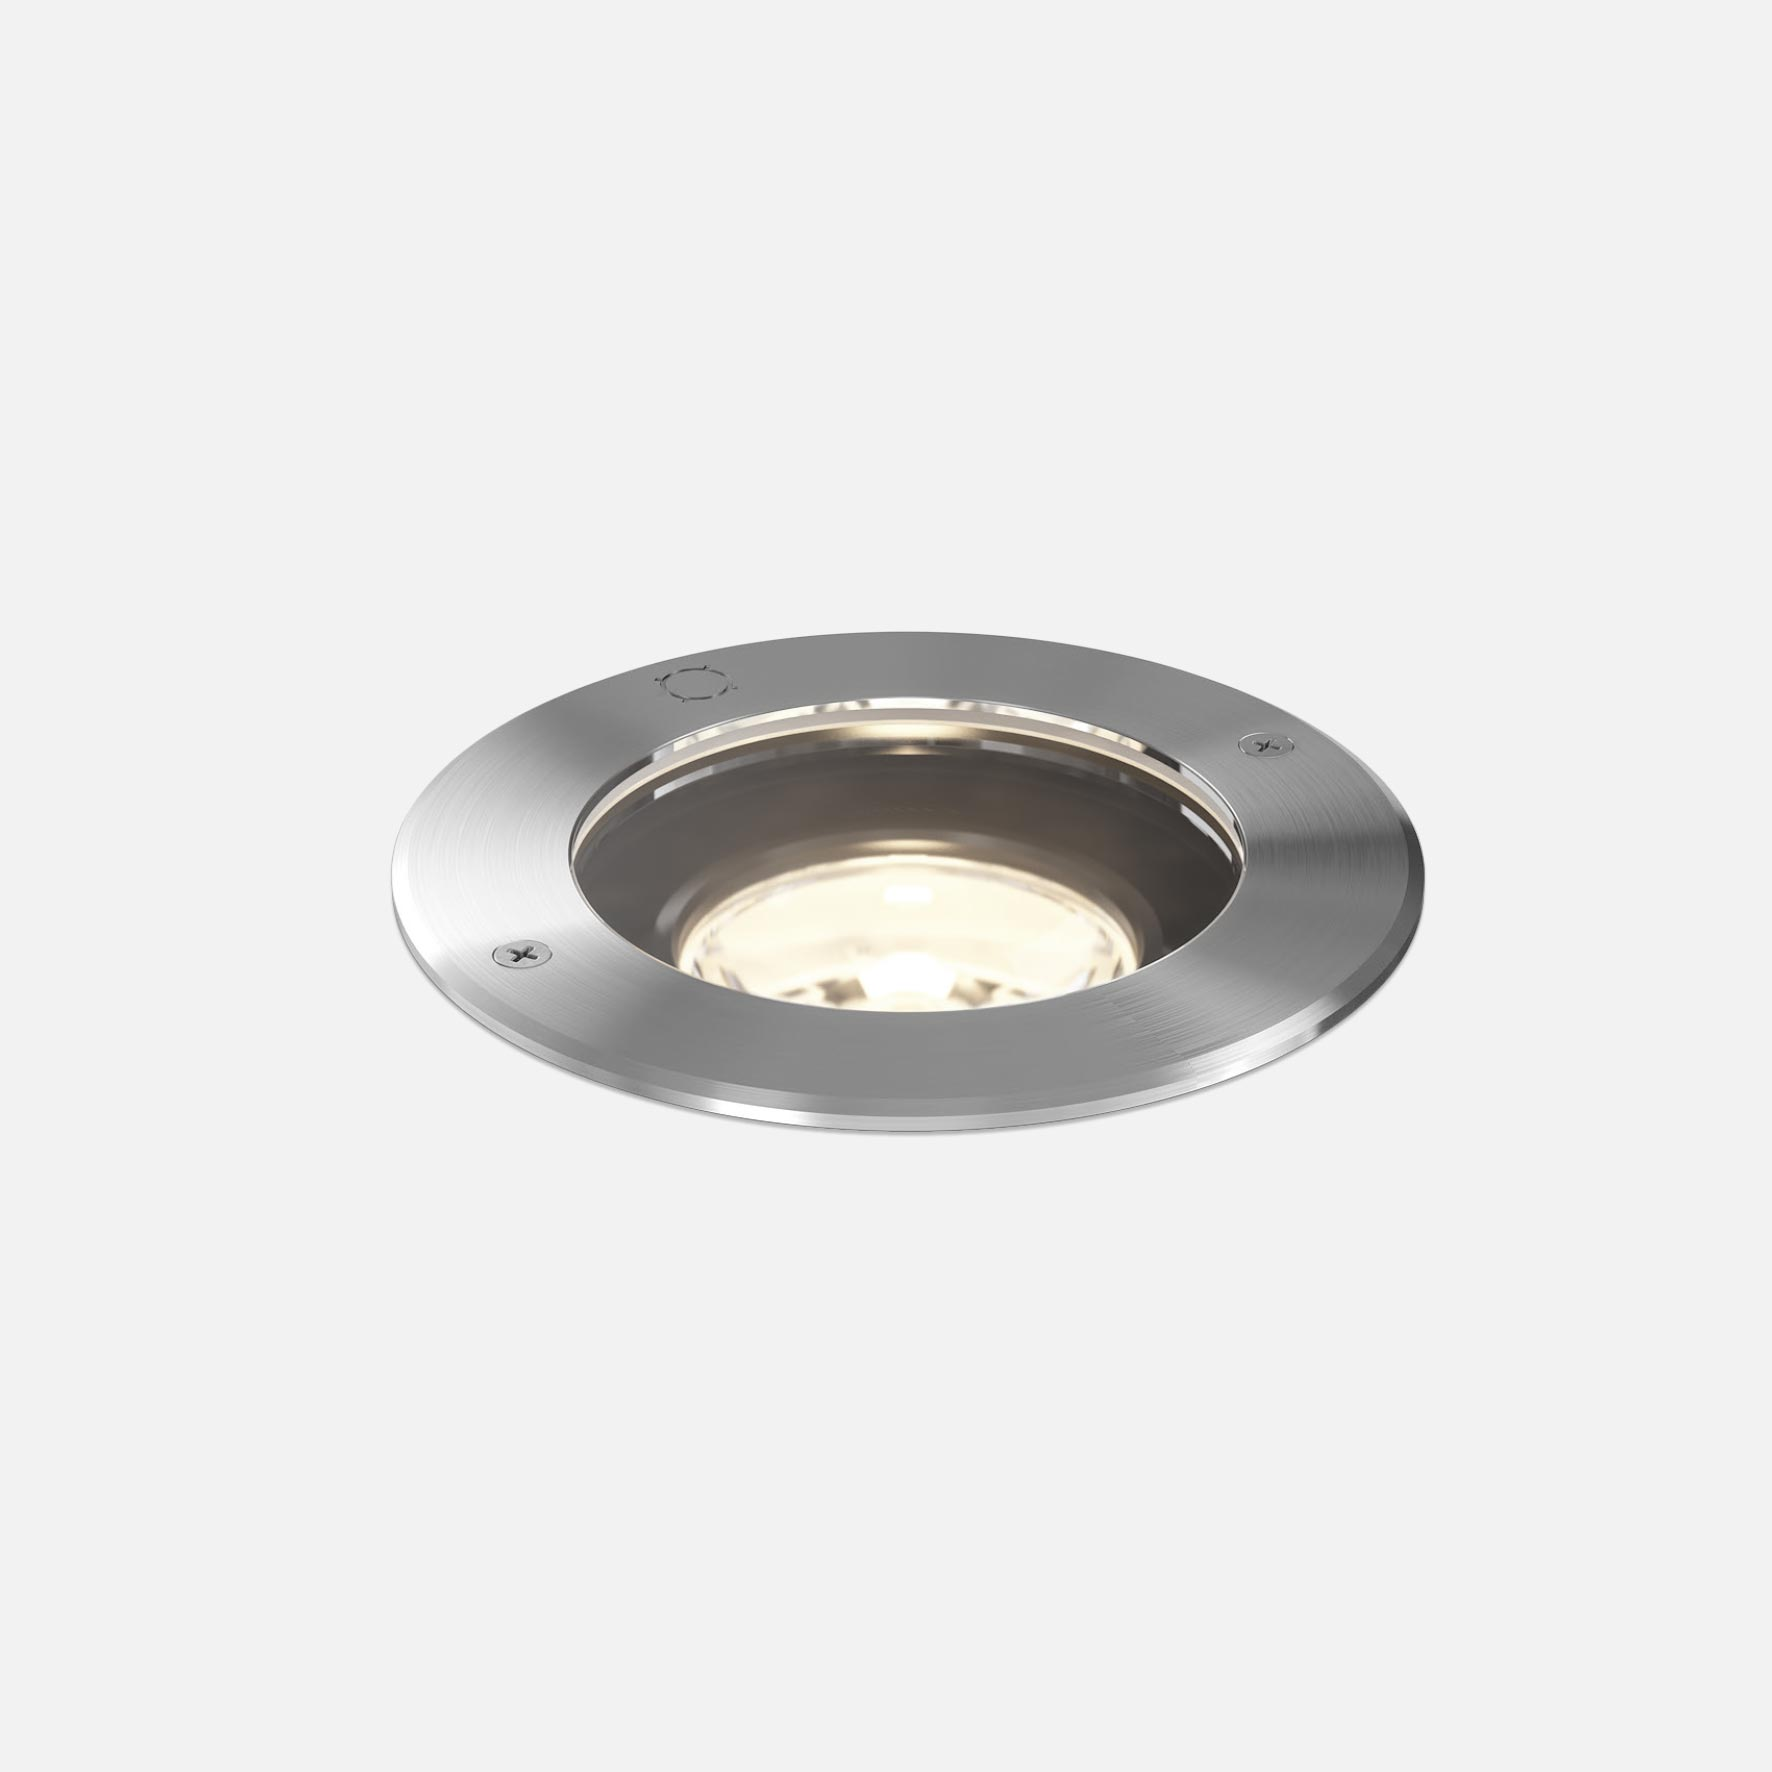 Flip 1.6 inox beam angle 24d